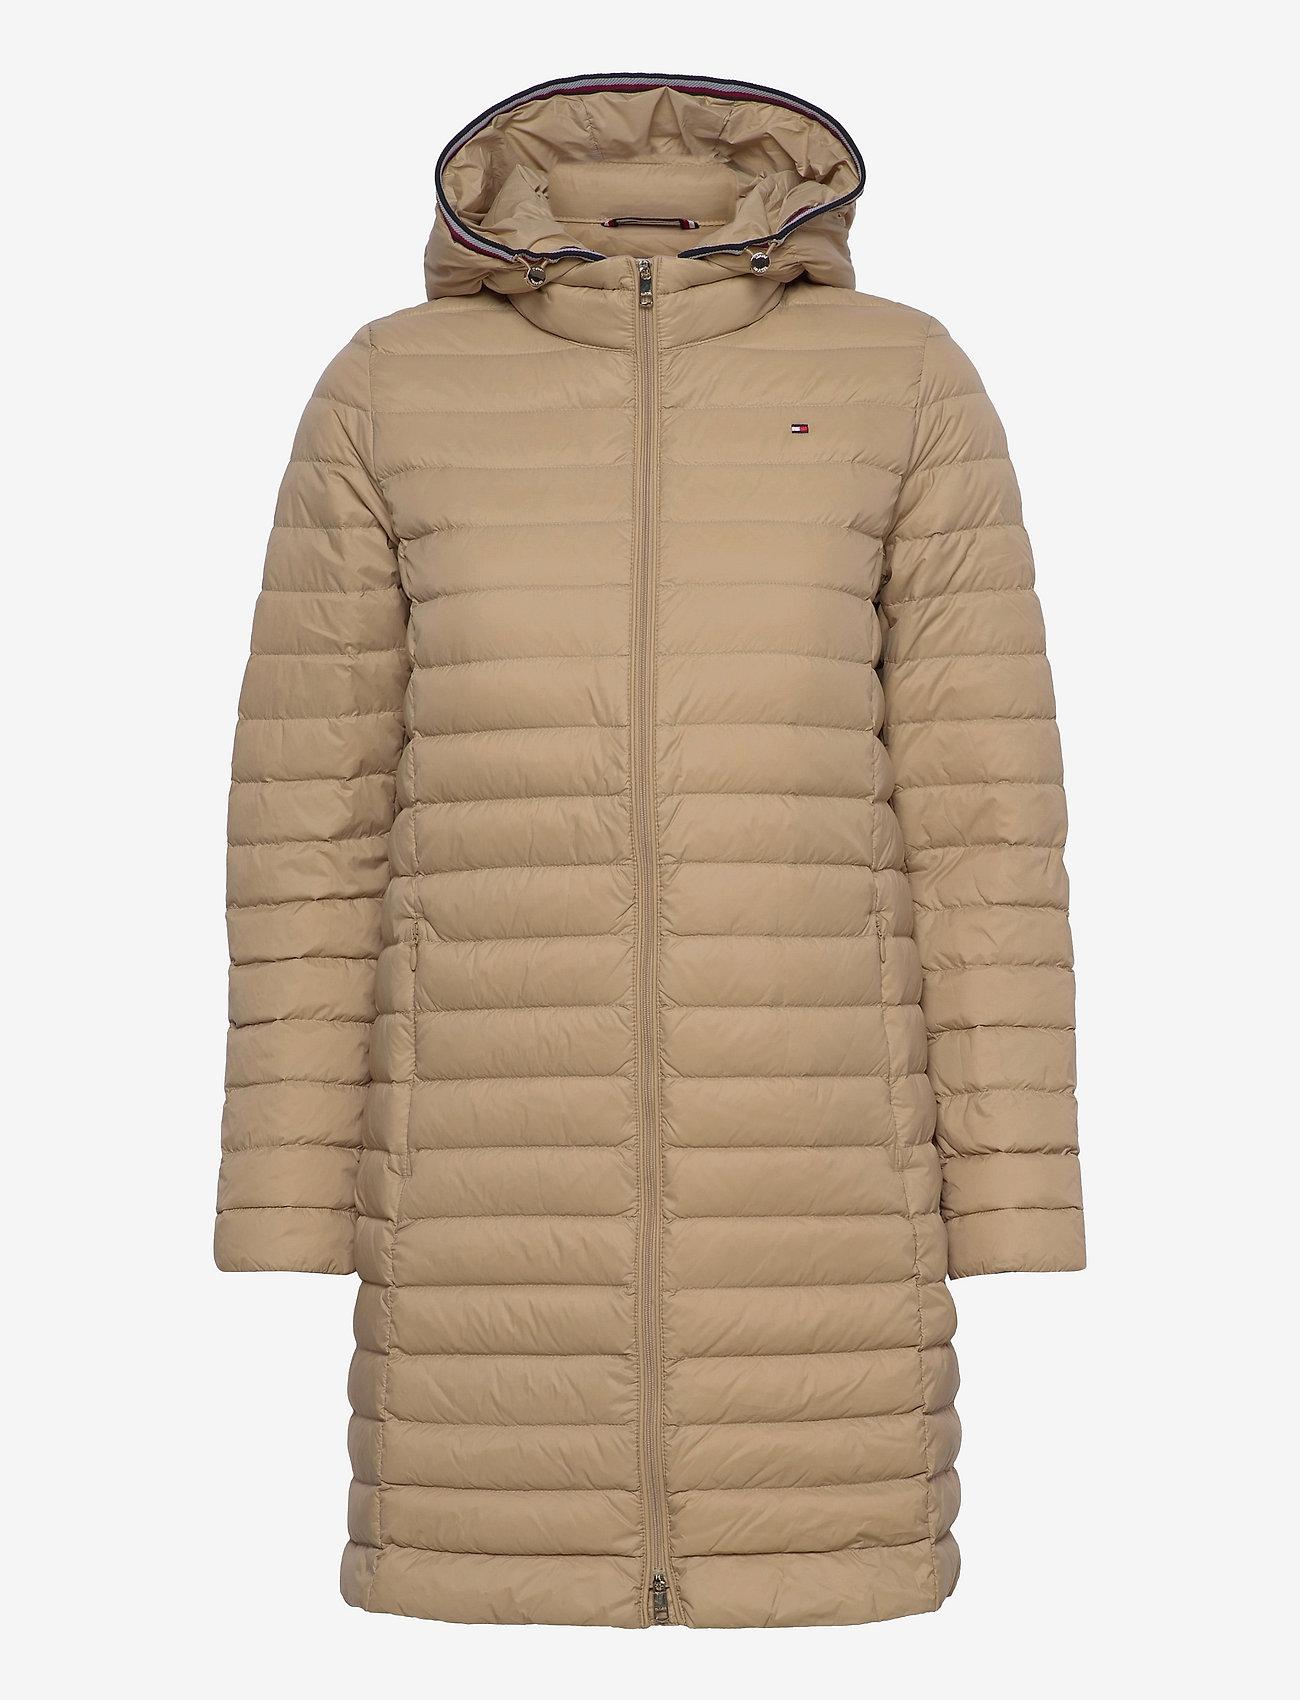 Tommy Hilfiger - TH ESS LW DOWN COAT - winter coats - beige - 0